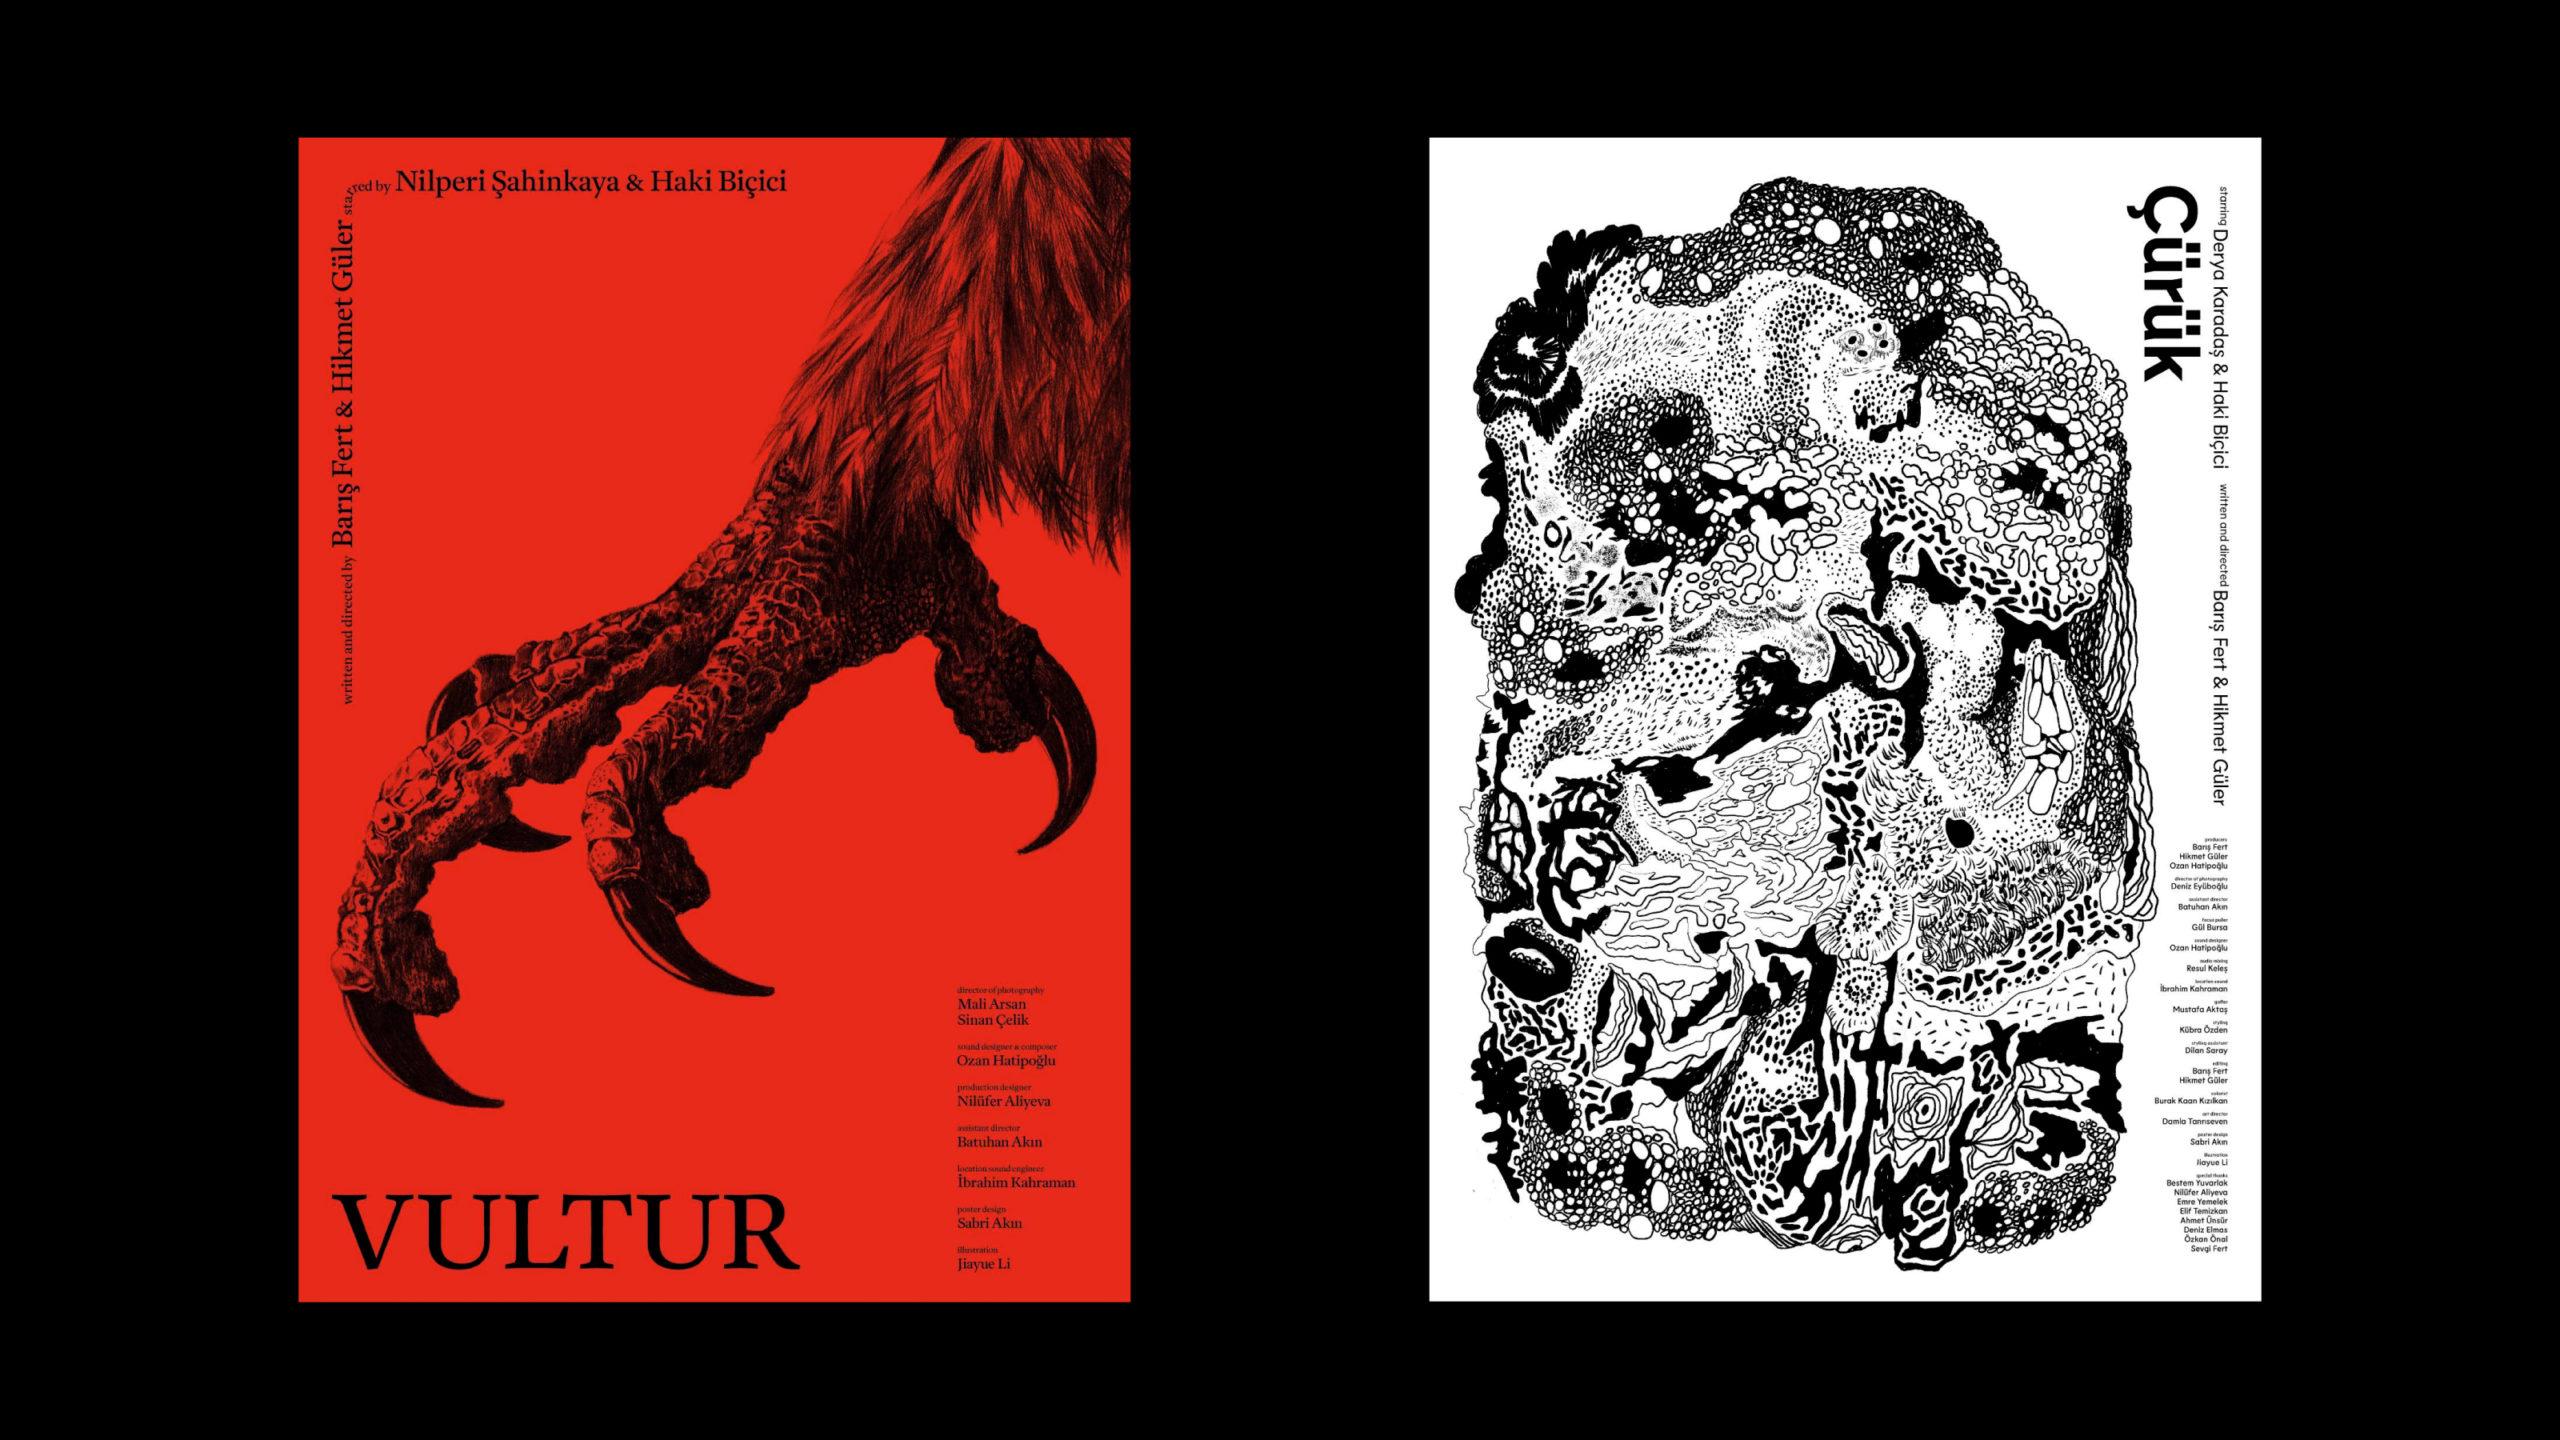 Vultur posters